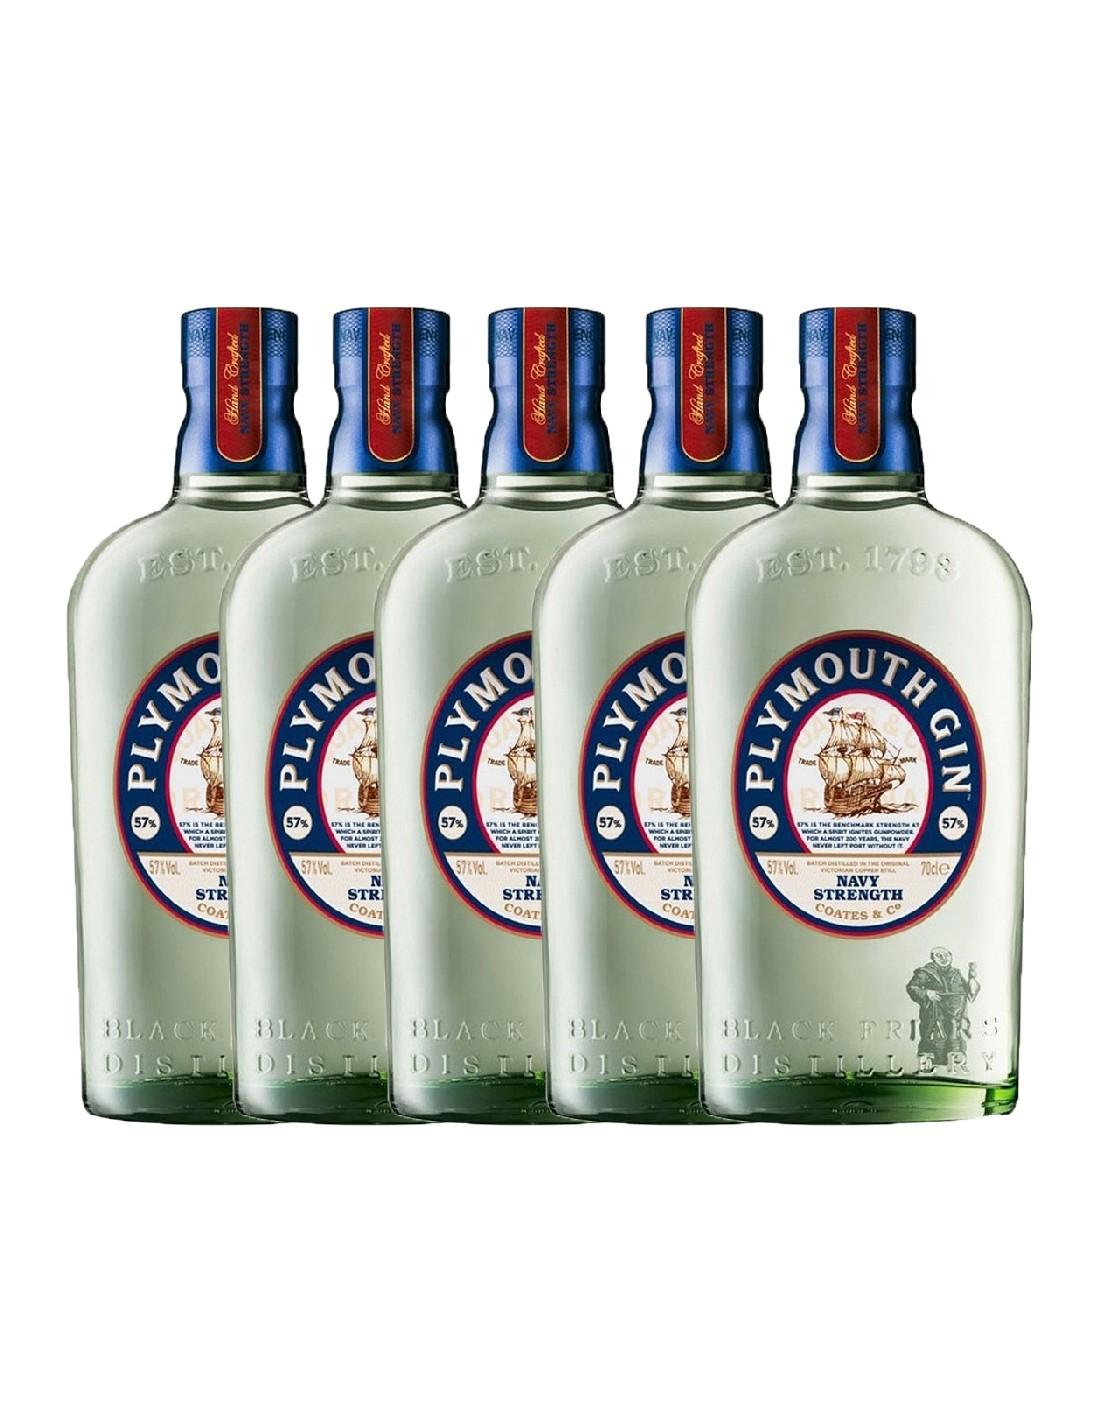 Pachet 5 sticle Gin Plymouth 41.2% alc., 0.7L, Anglia